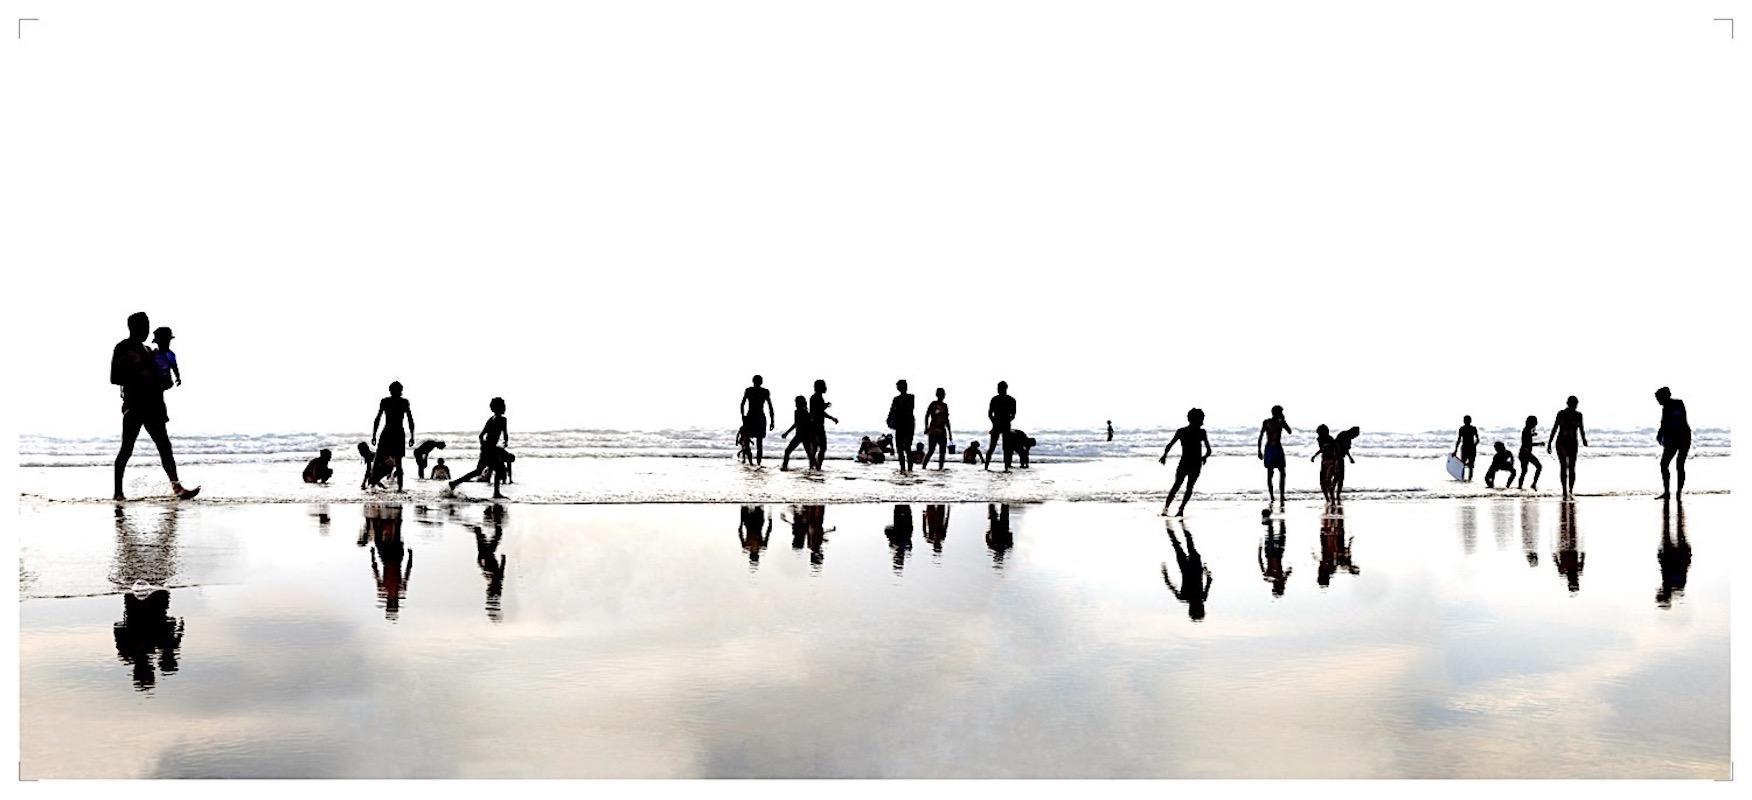 Plage 6 Ed.7 - 21st Century, Contemporary, Beach Landscape Photography